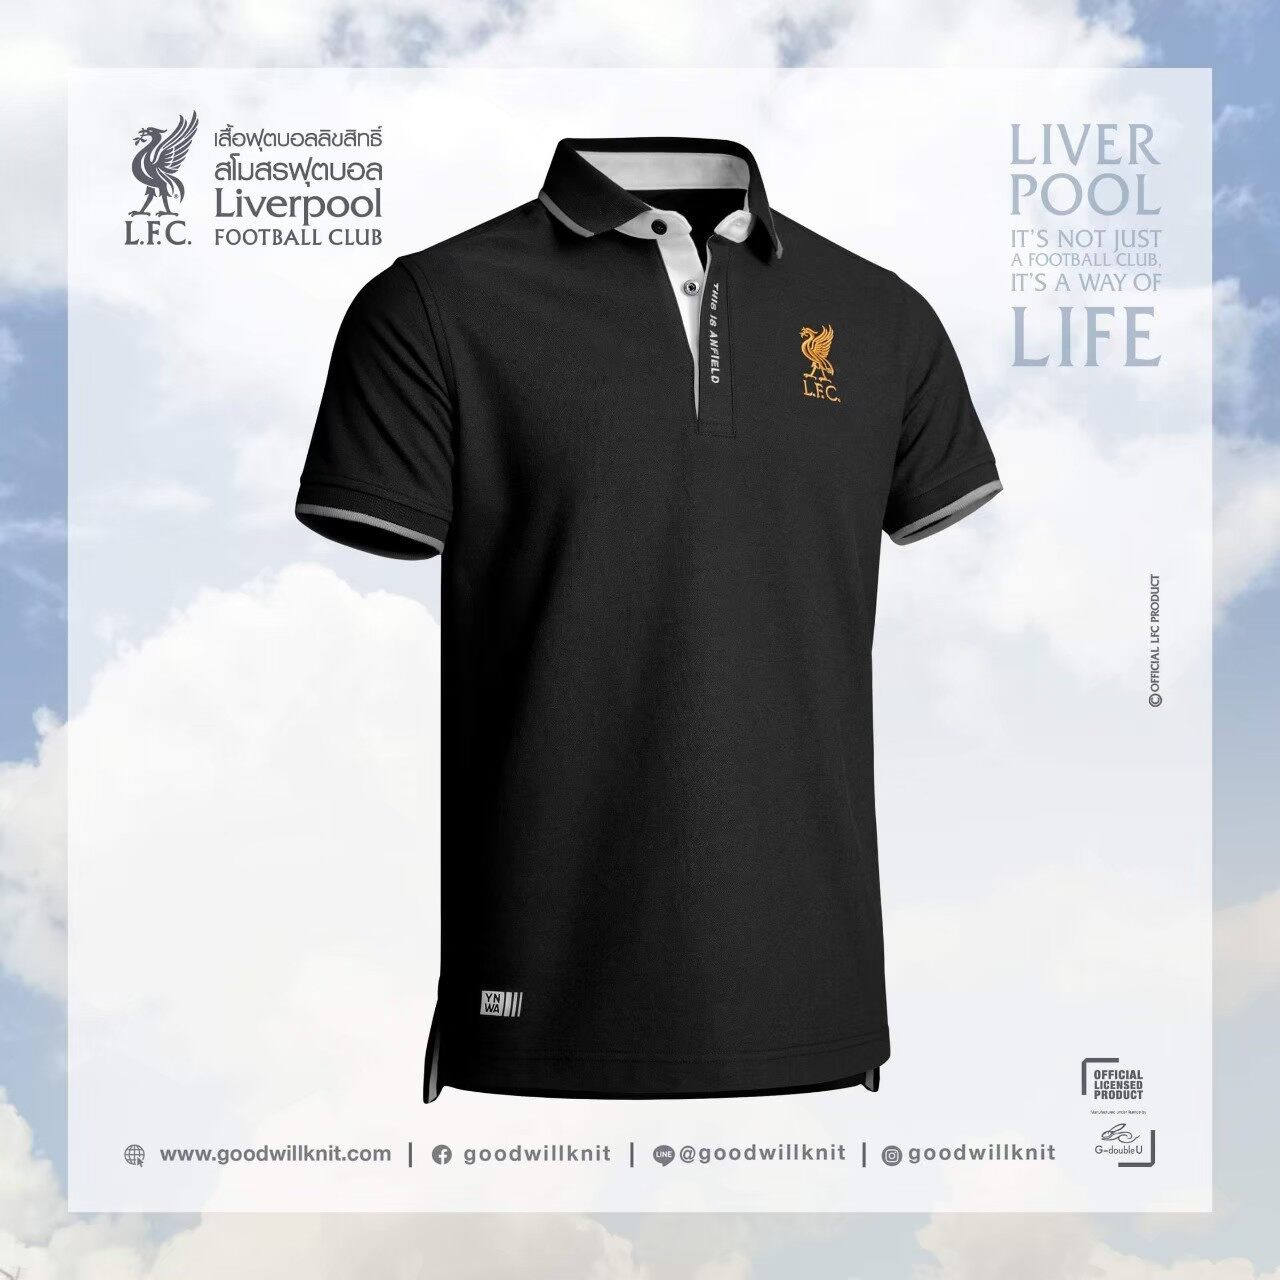 Goodwillknit Liverpool เสื้อลิเวอร์พูล เสื้อโปโล ลิเวอร์พูล ลิขสิทธิ์ C041 มี 3 สี.